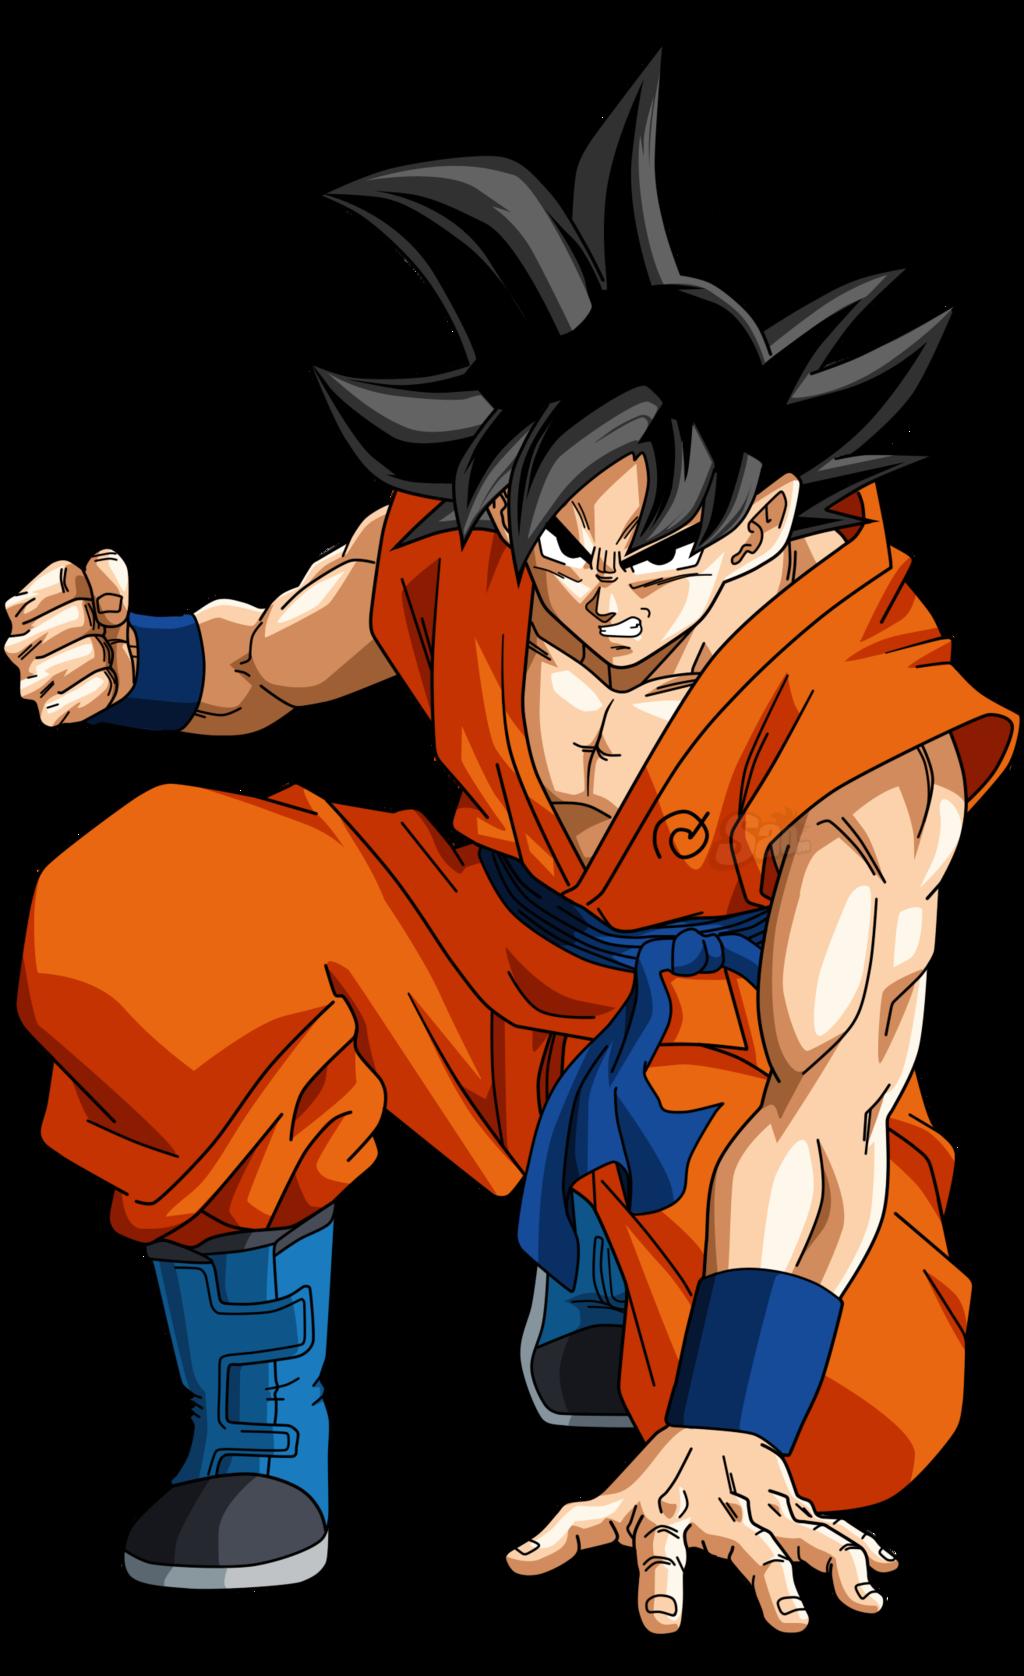 Free PNG Dragon Ball Z Goku.